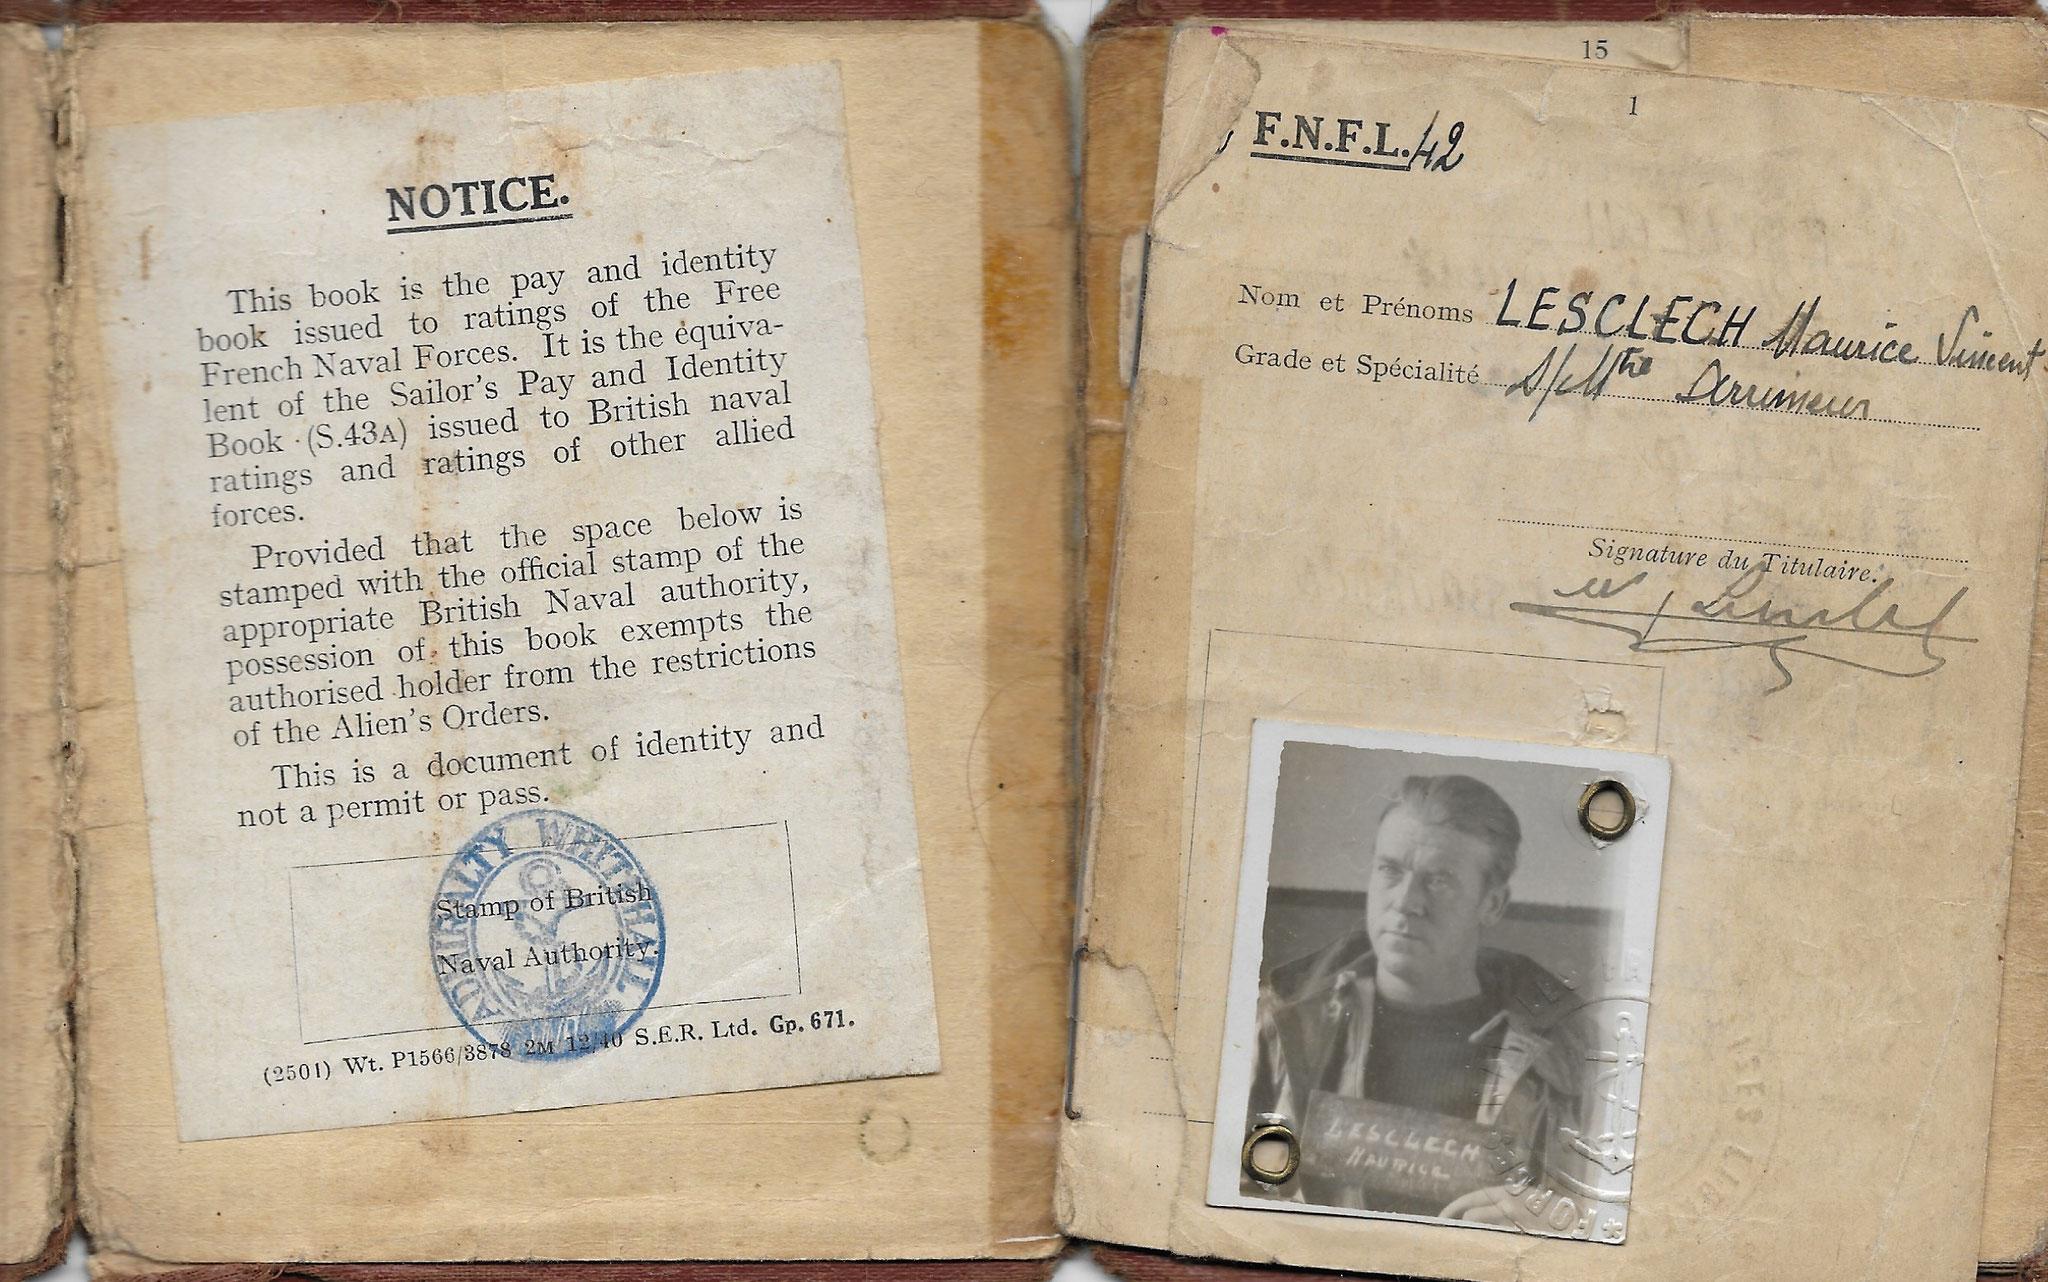 Pays Book RAF - copyright Jacques Lesclech